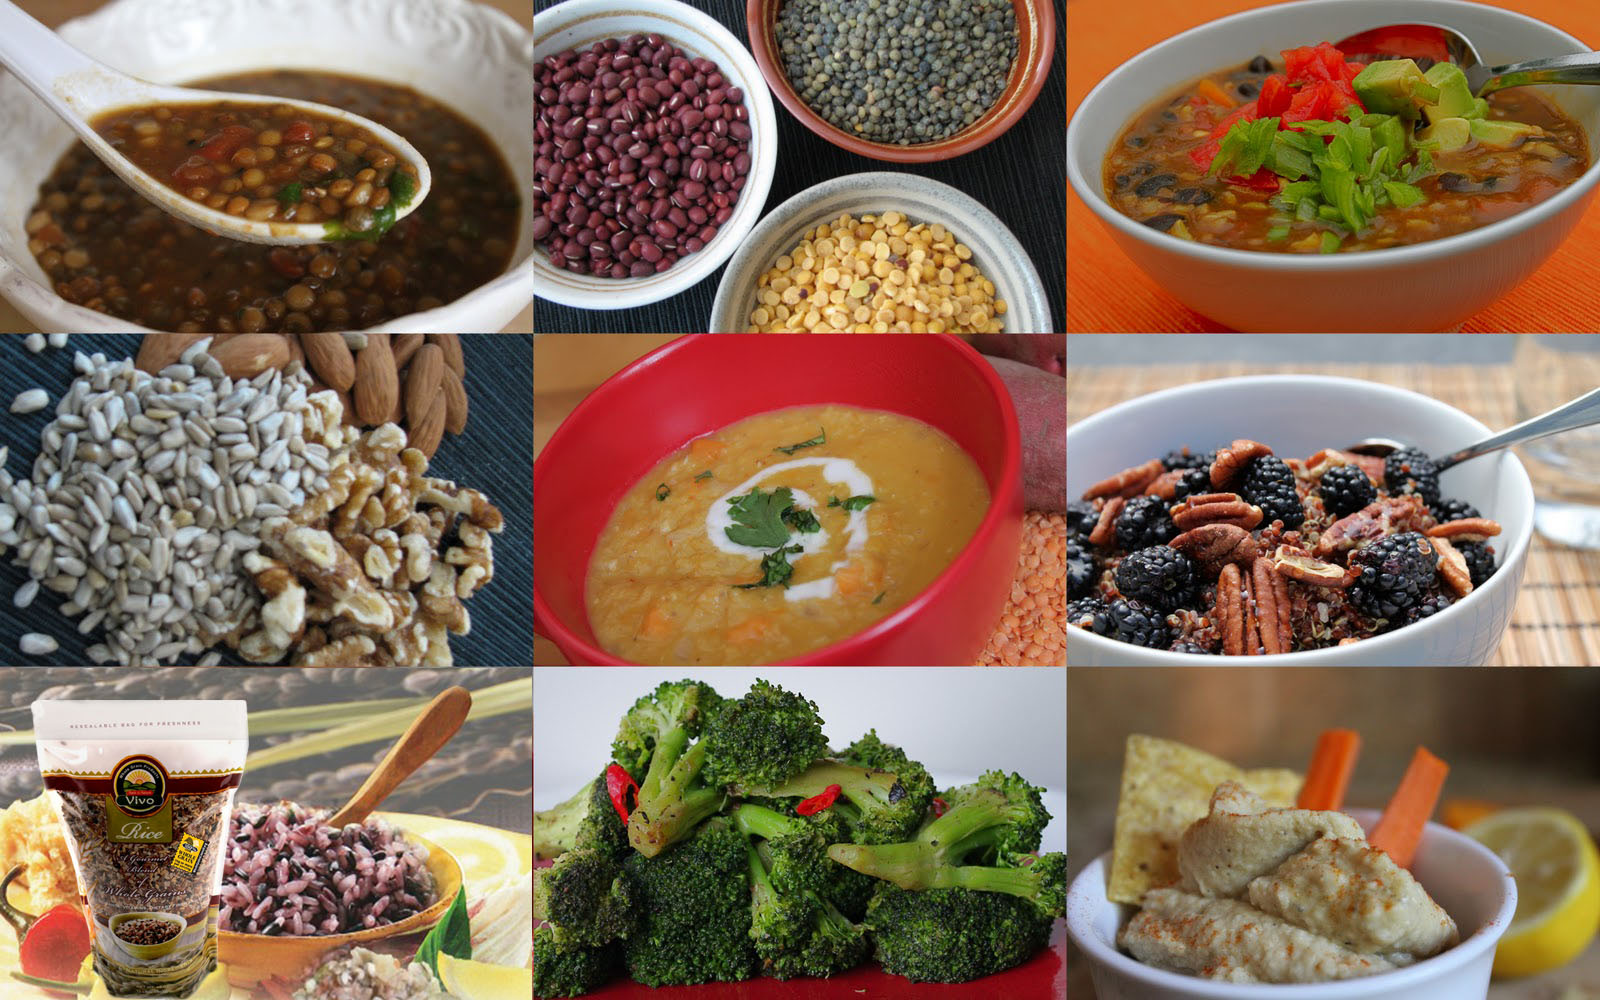 high-fiber-foods.jpg